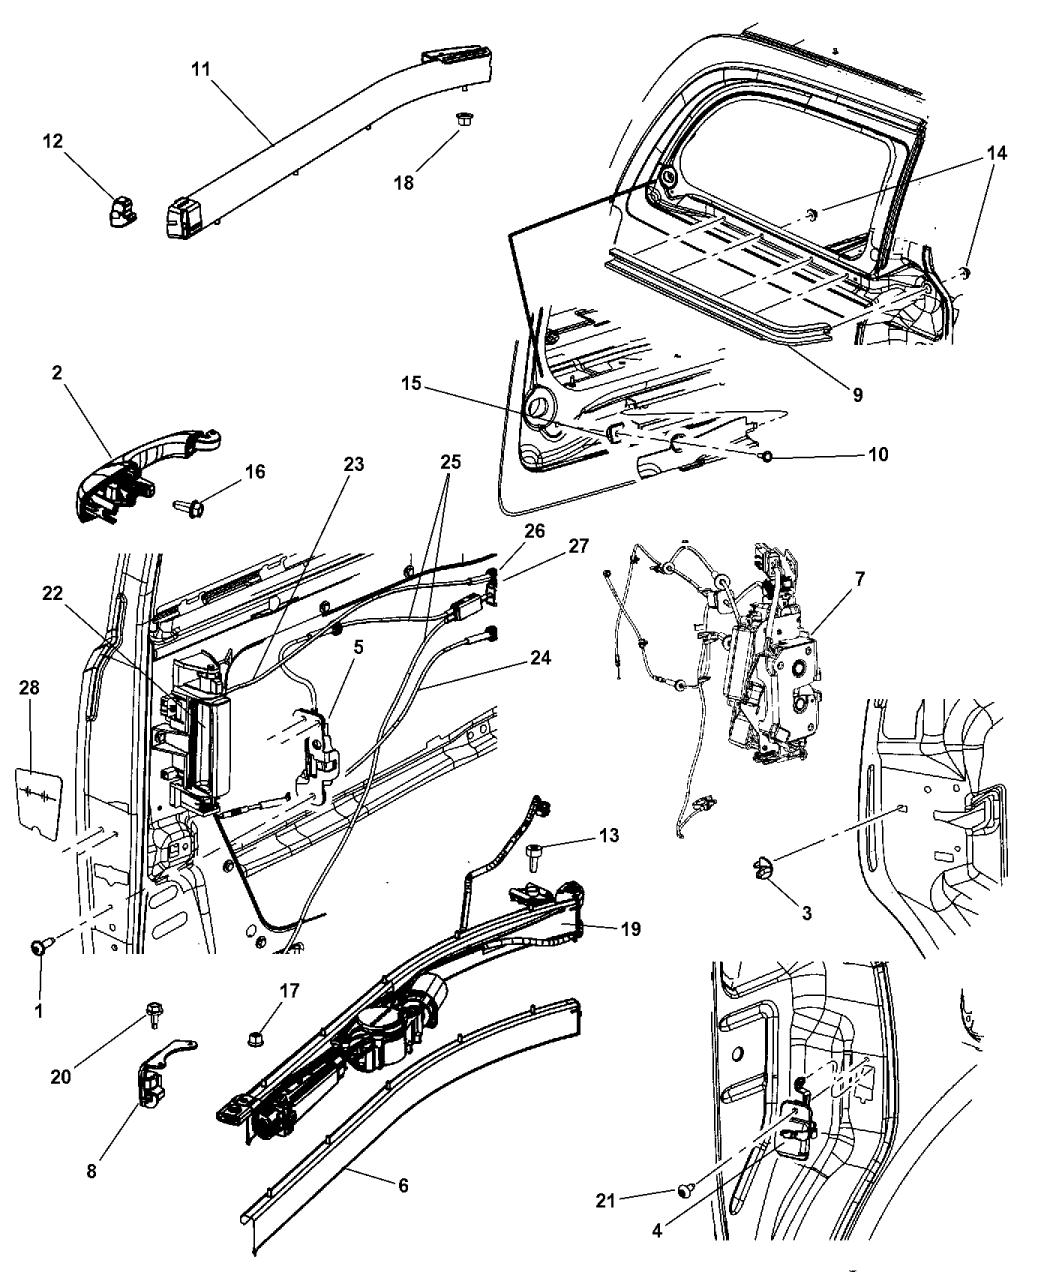 2001 Dodge Caravan Power Sliding Door Parts Diagram Manual Guide